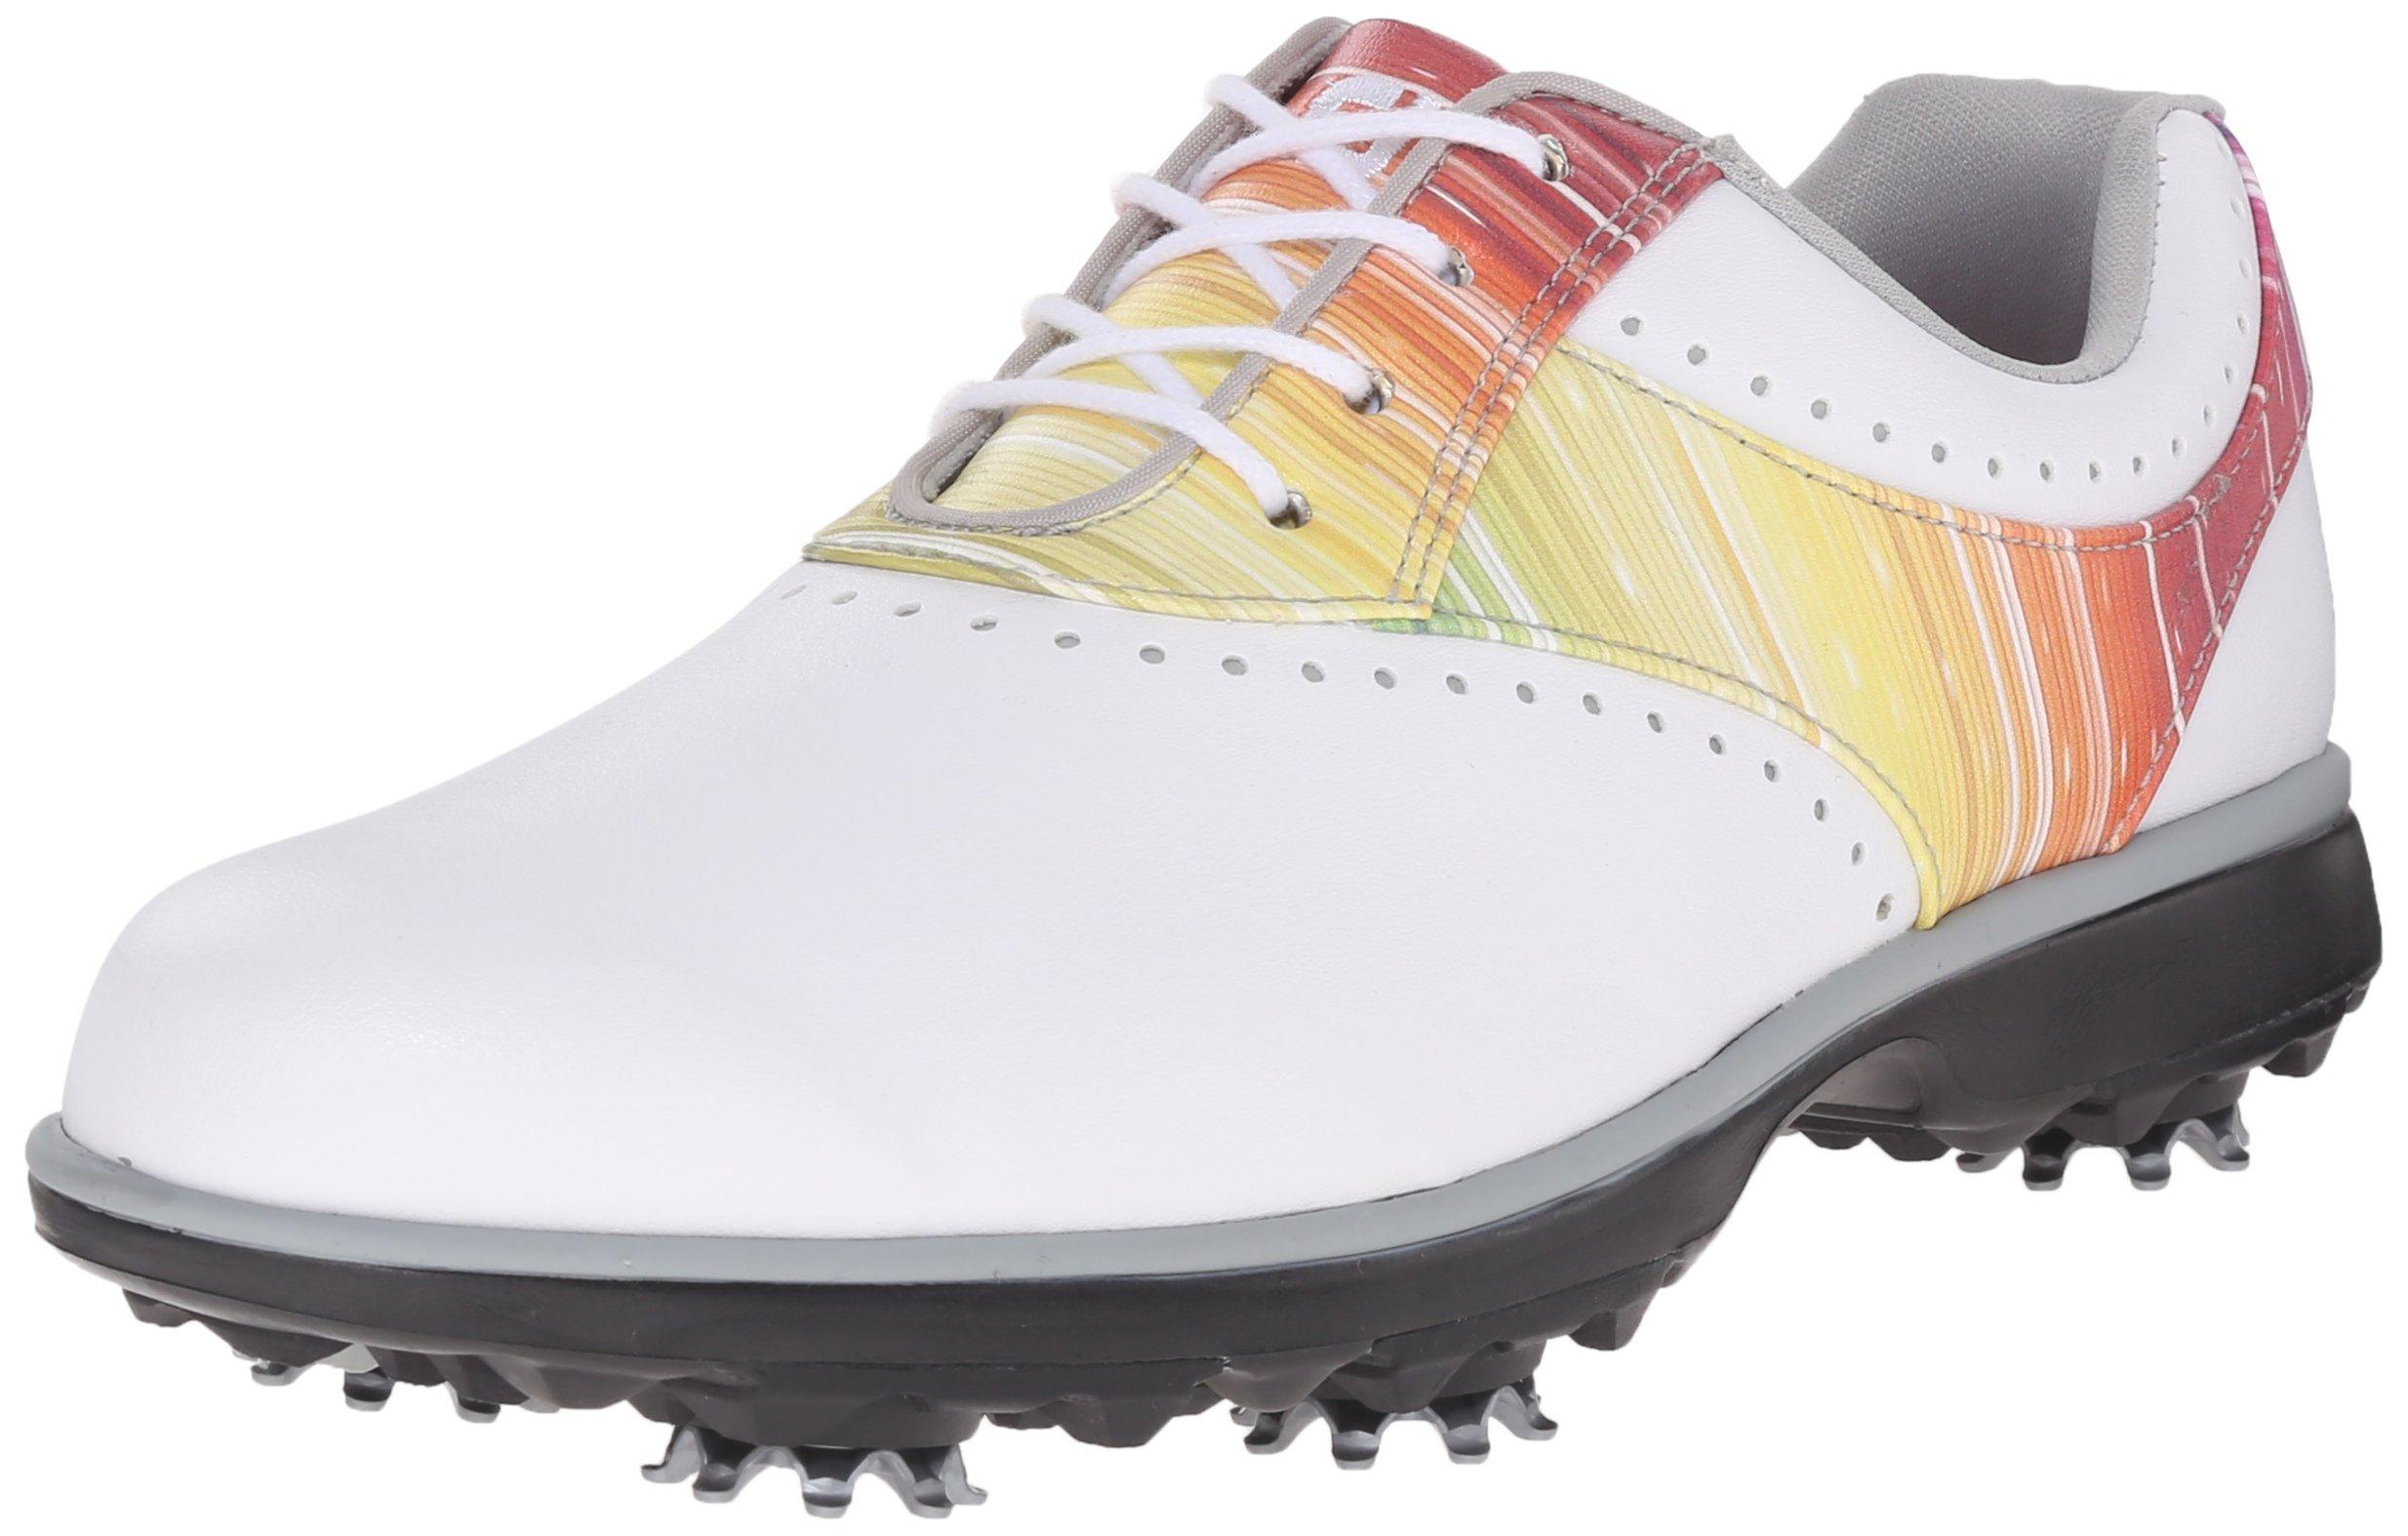 FootJoy Emerge Golf Shoes Closeout 2017 Women White/Rainbow Medium 7